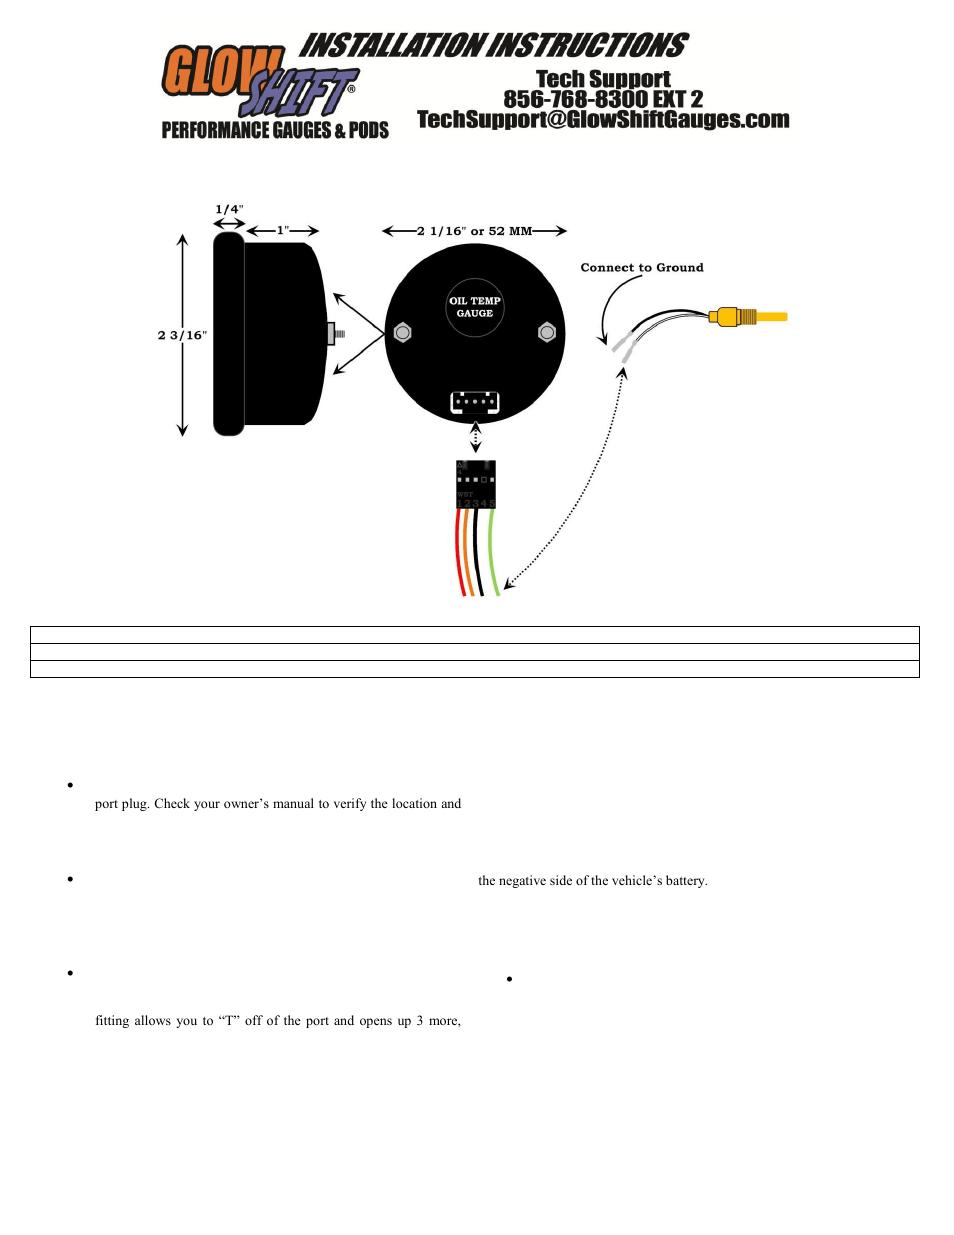 medium resolution of glowshift digital series celsius oil temperature gauge user manual